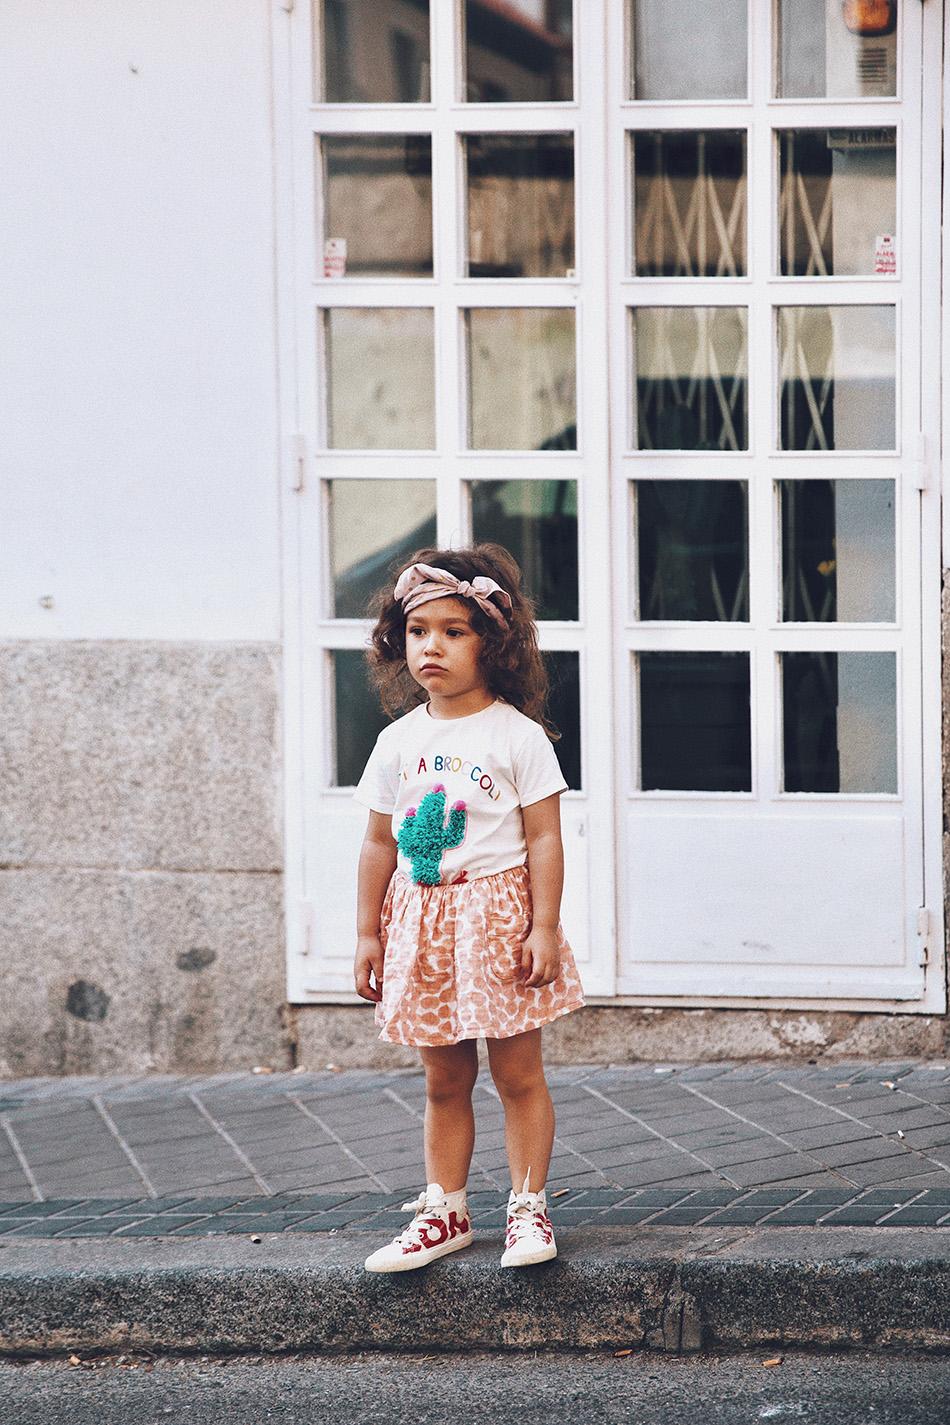 Bárbara Crespo streetstyle. T-Shirt / Camiseta: Moitié Shop. Playsuit / Mono: Moitié Shop. Watch / Reloj: Michael Kors. Necklace / Collar de palmera: Moitié Shop. Bag / Bolso: Michael Kors. Bracelet / Pulsera de plata: Kiabi. Bracelet / Pulsera de brillantitos: Swarovski. Sunglasses / Gafas de sol: Mango